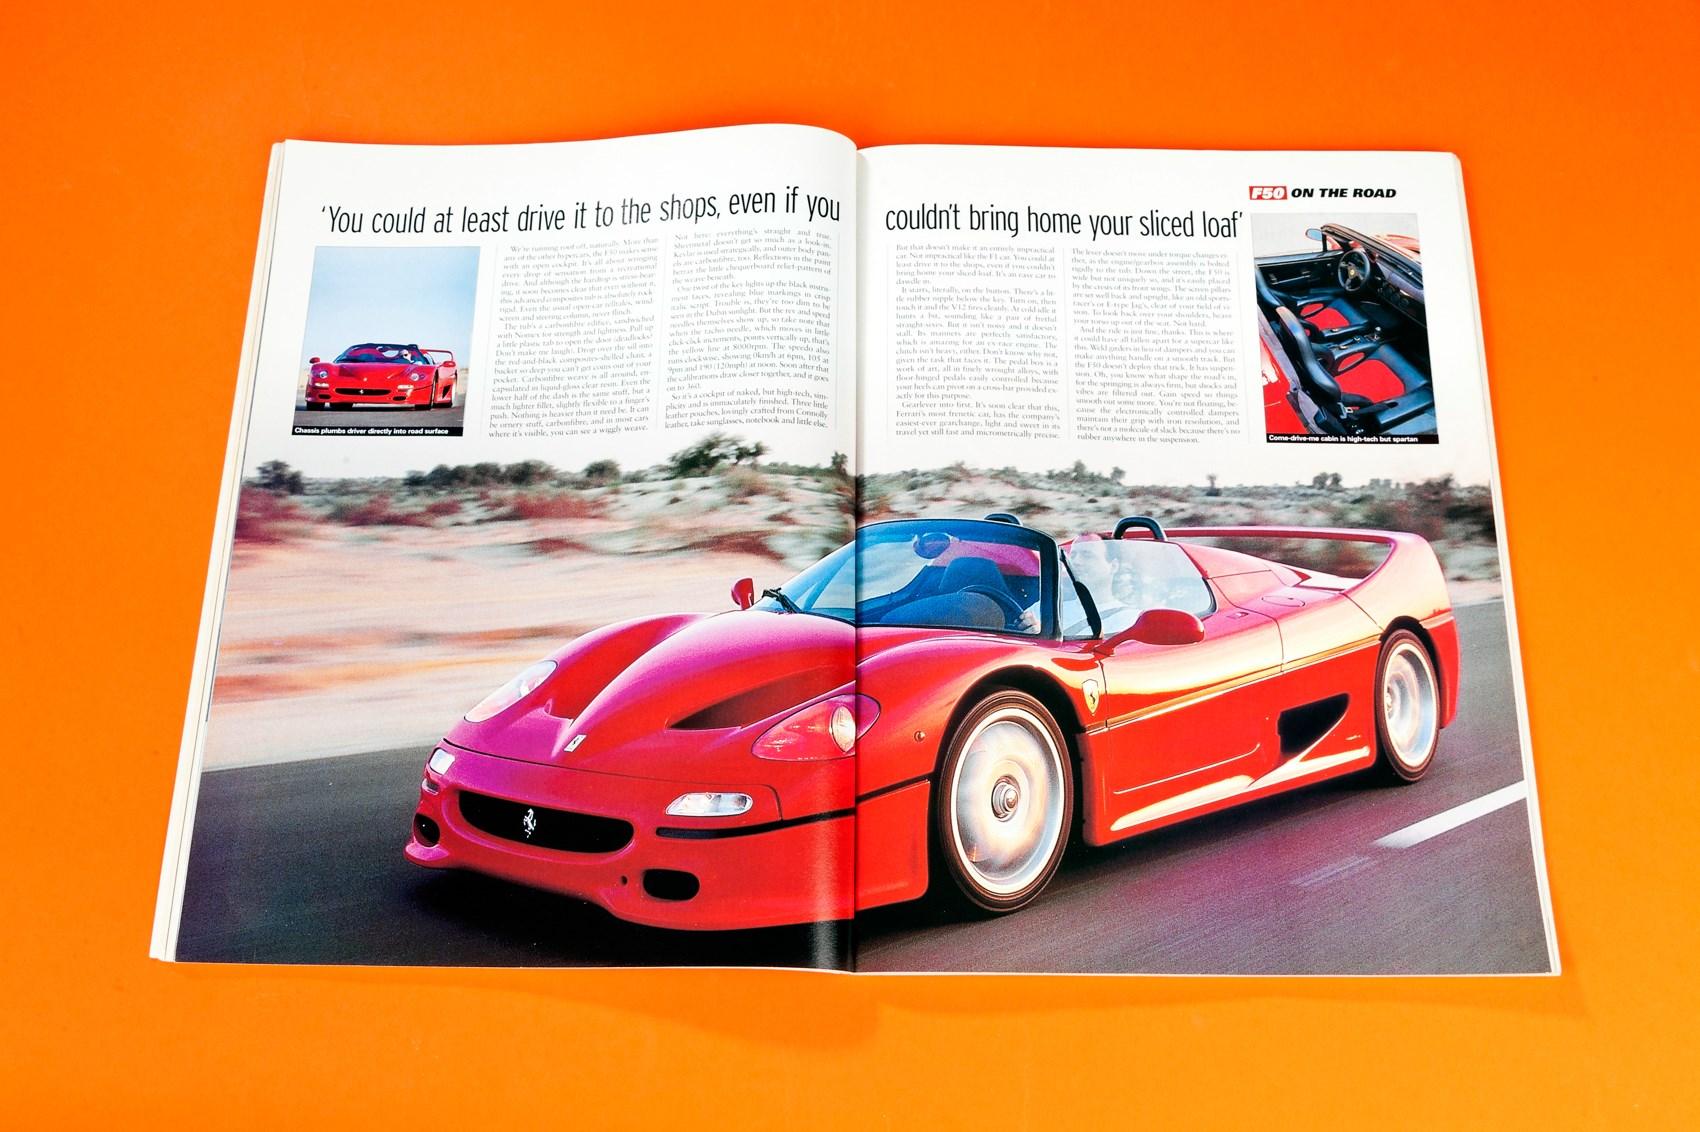 Legalised Ecstasy The First Ferrari F50 Road Test Car